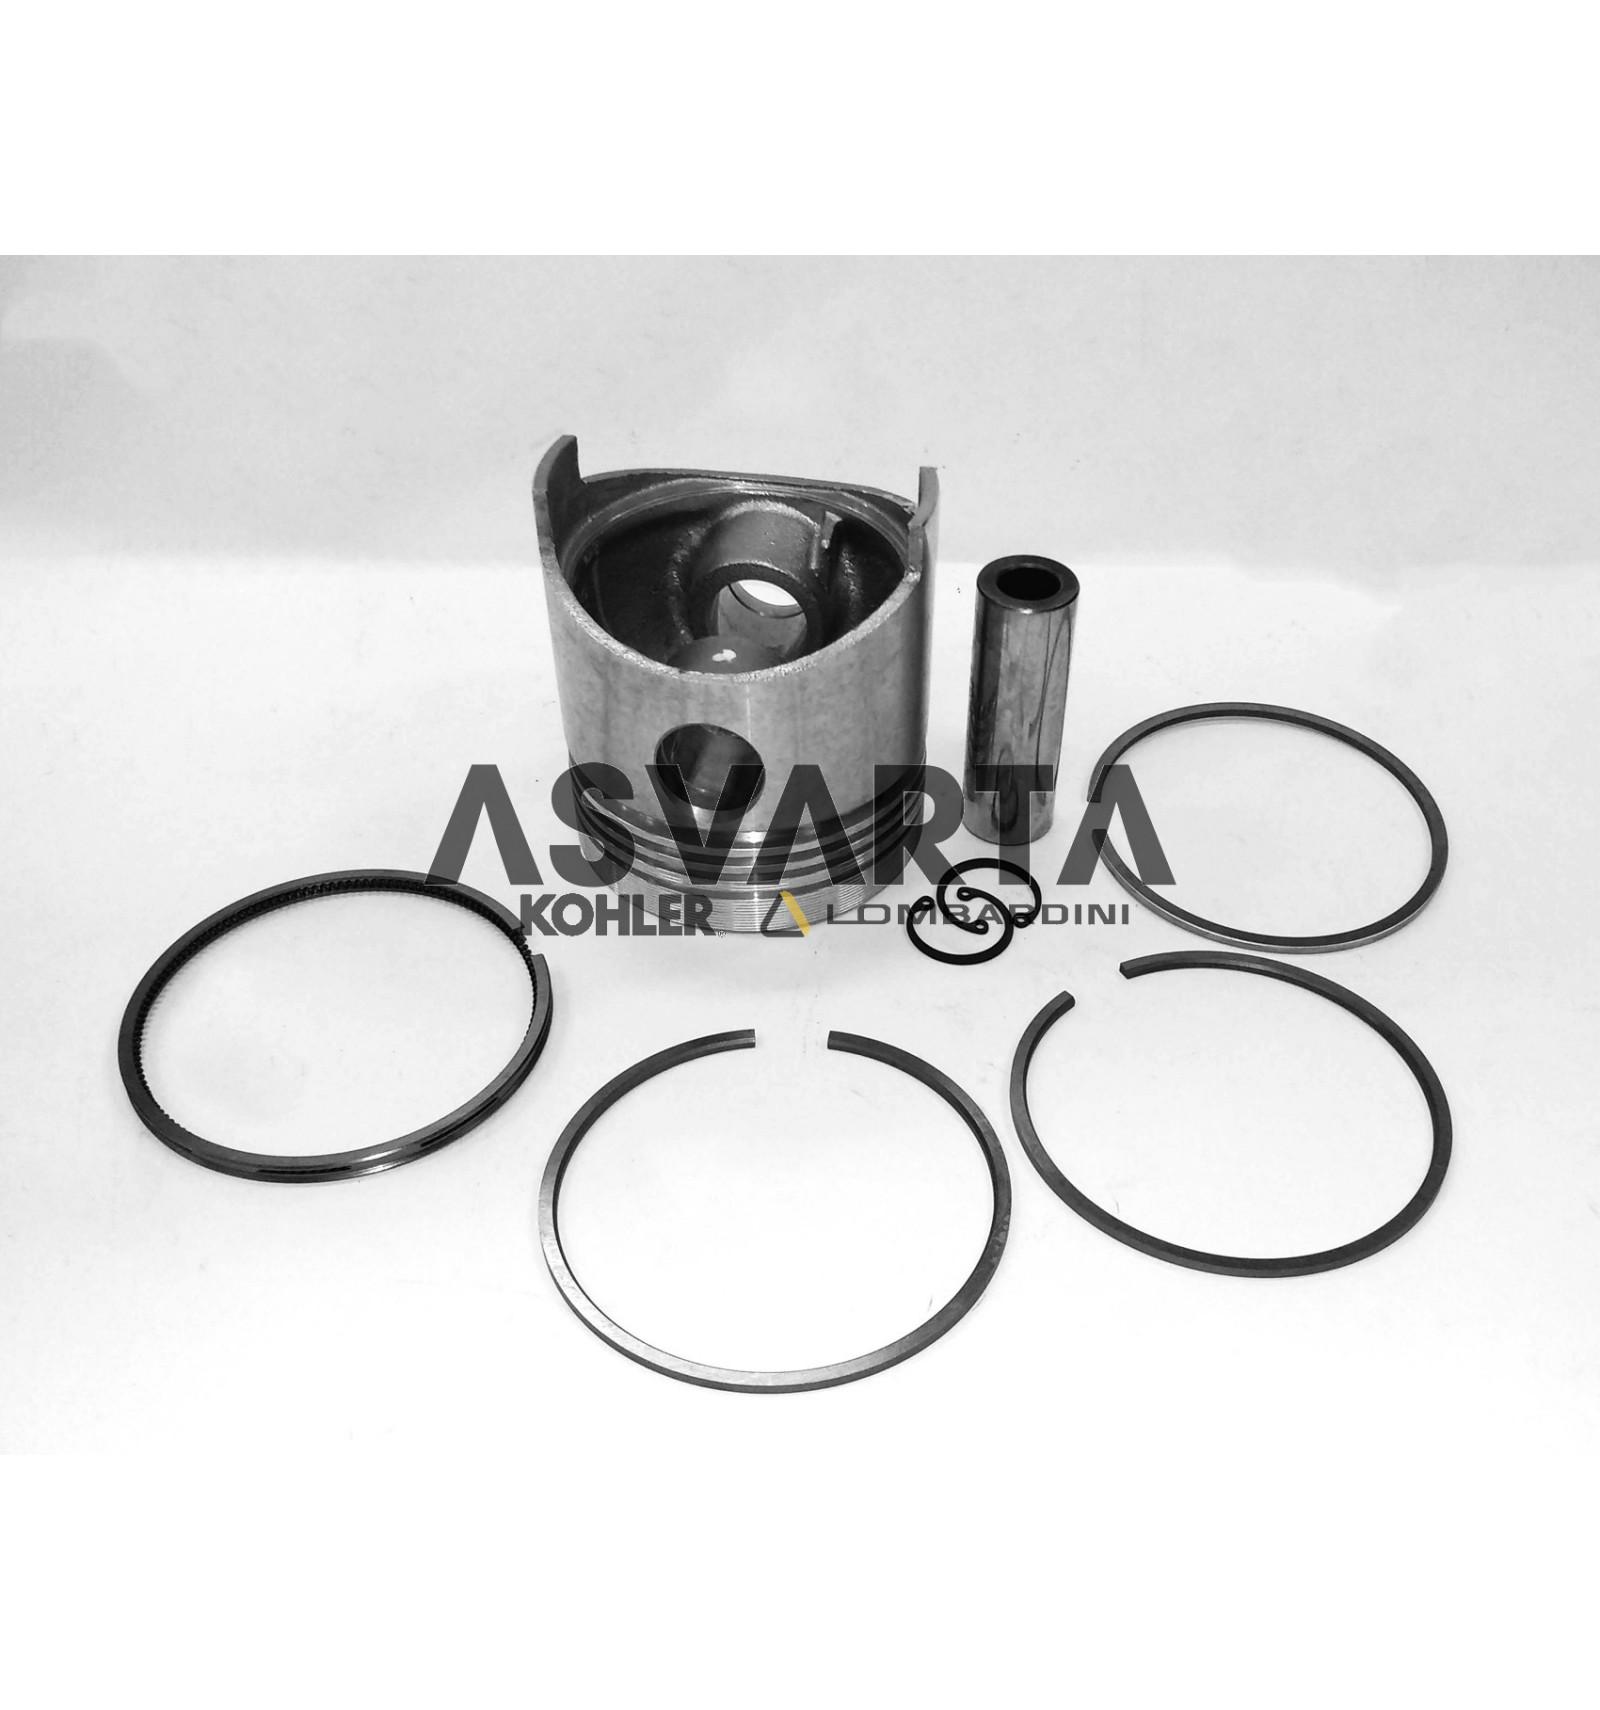 95mm #0021750000 RP280 CRD 951//2 Piston Ring Set for RUGGERINI CRD951